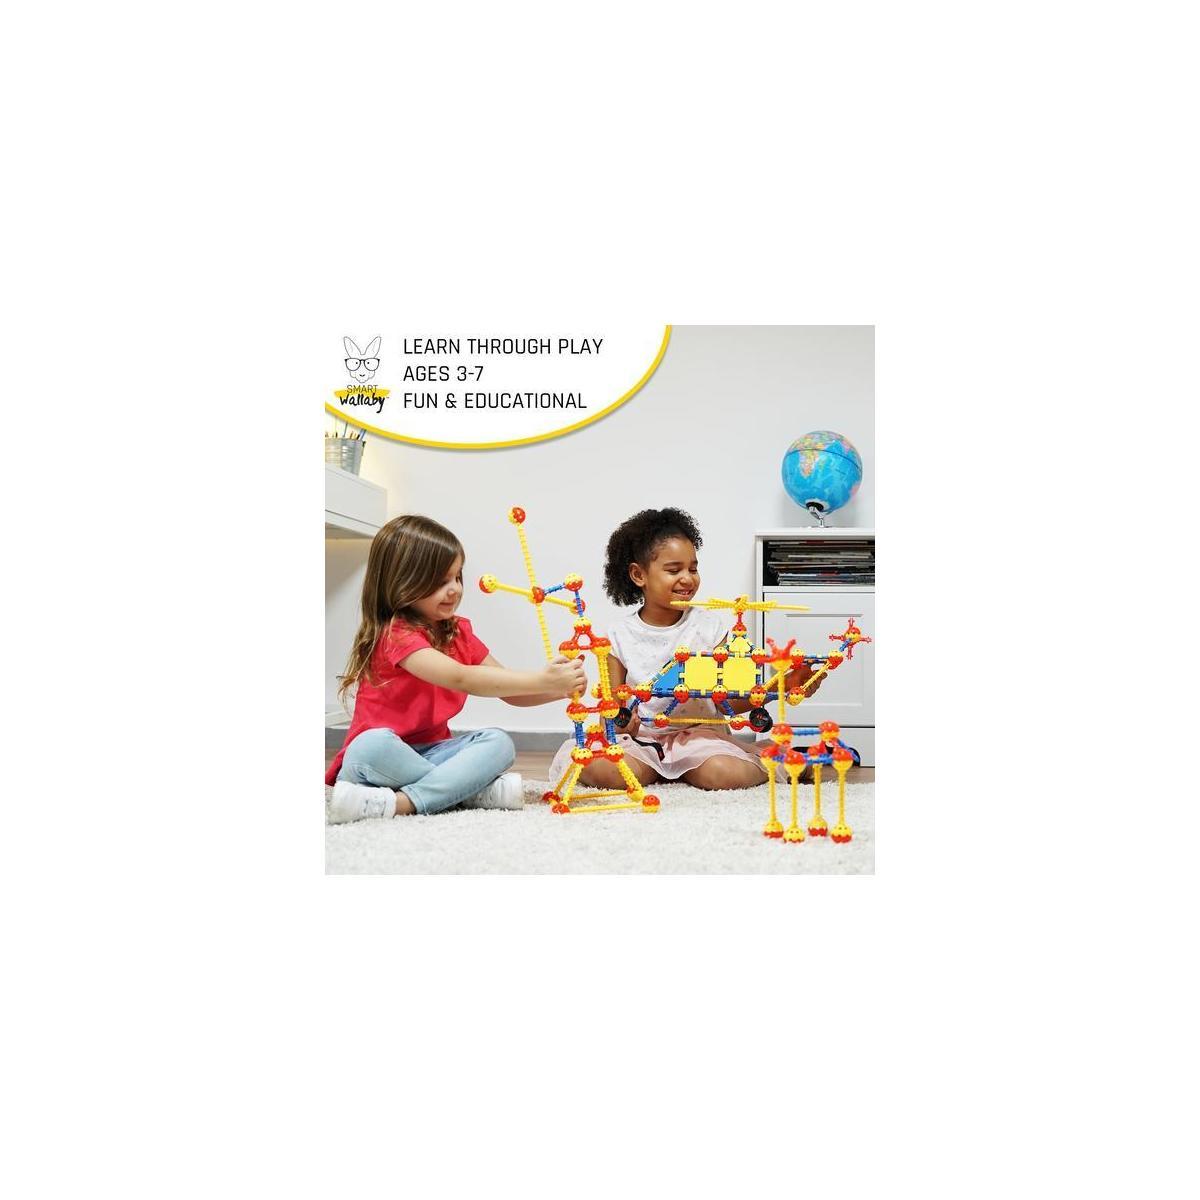 SMART WALLABY Space Building Set for Kids Ages 3+ – STEM & STEAM Creative Construction Blocks for Intellectual Development & Imagination – 160 pc. Building Kit for Boys & Girls + 56 pc. Bonus Toy